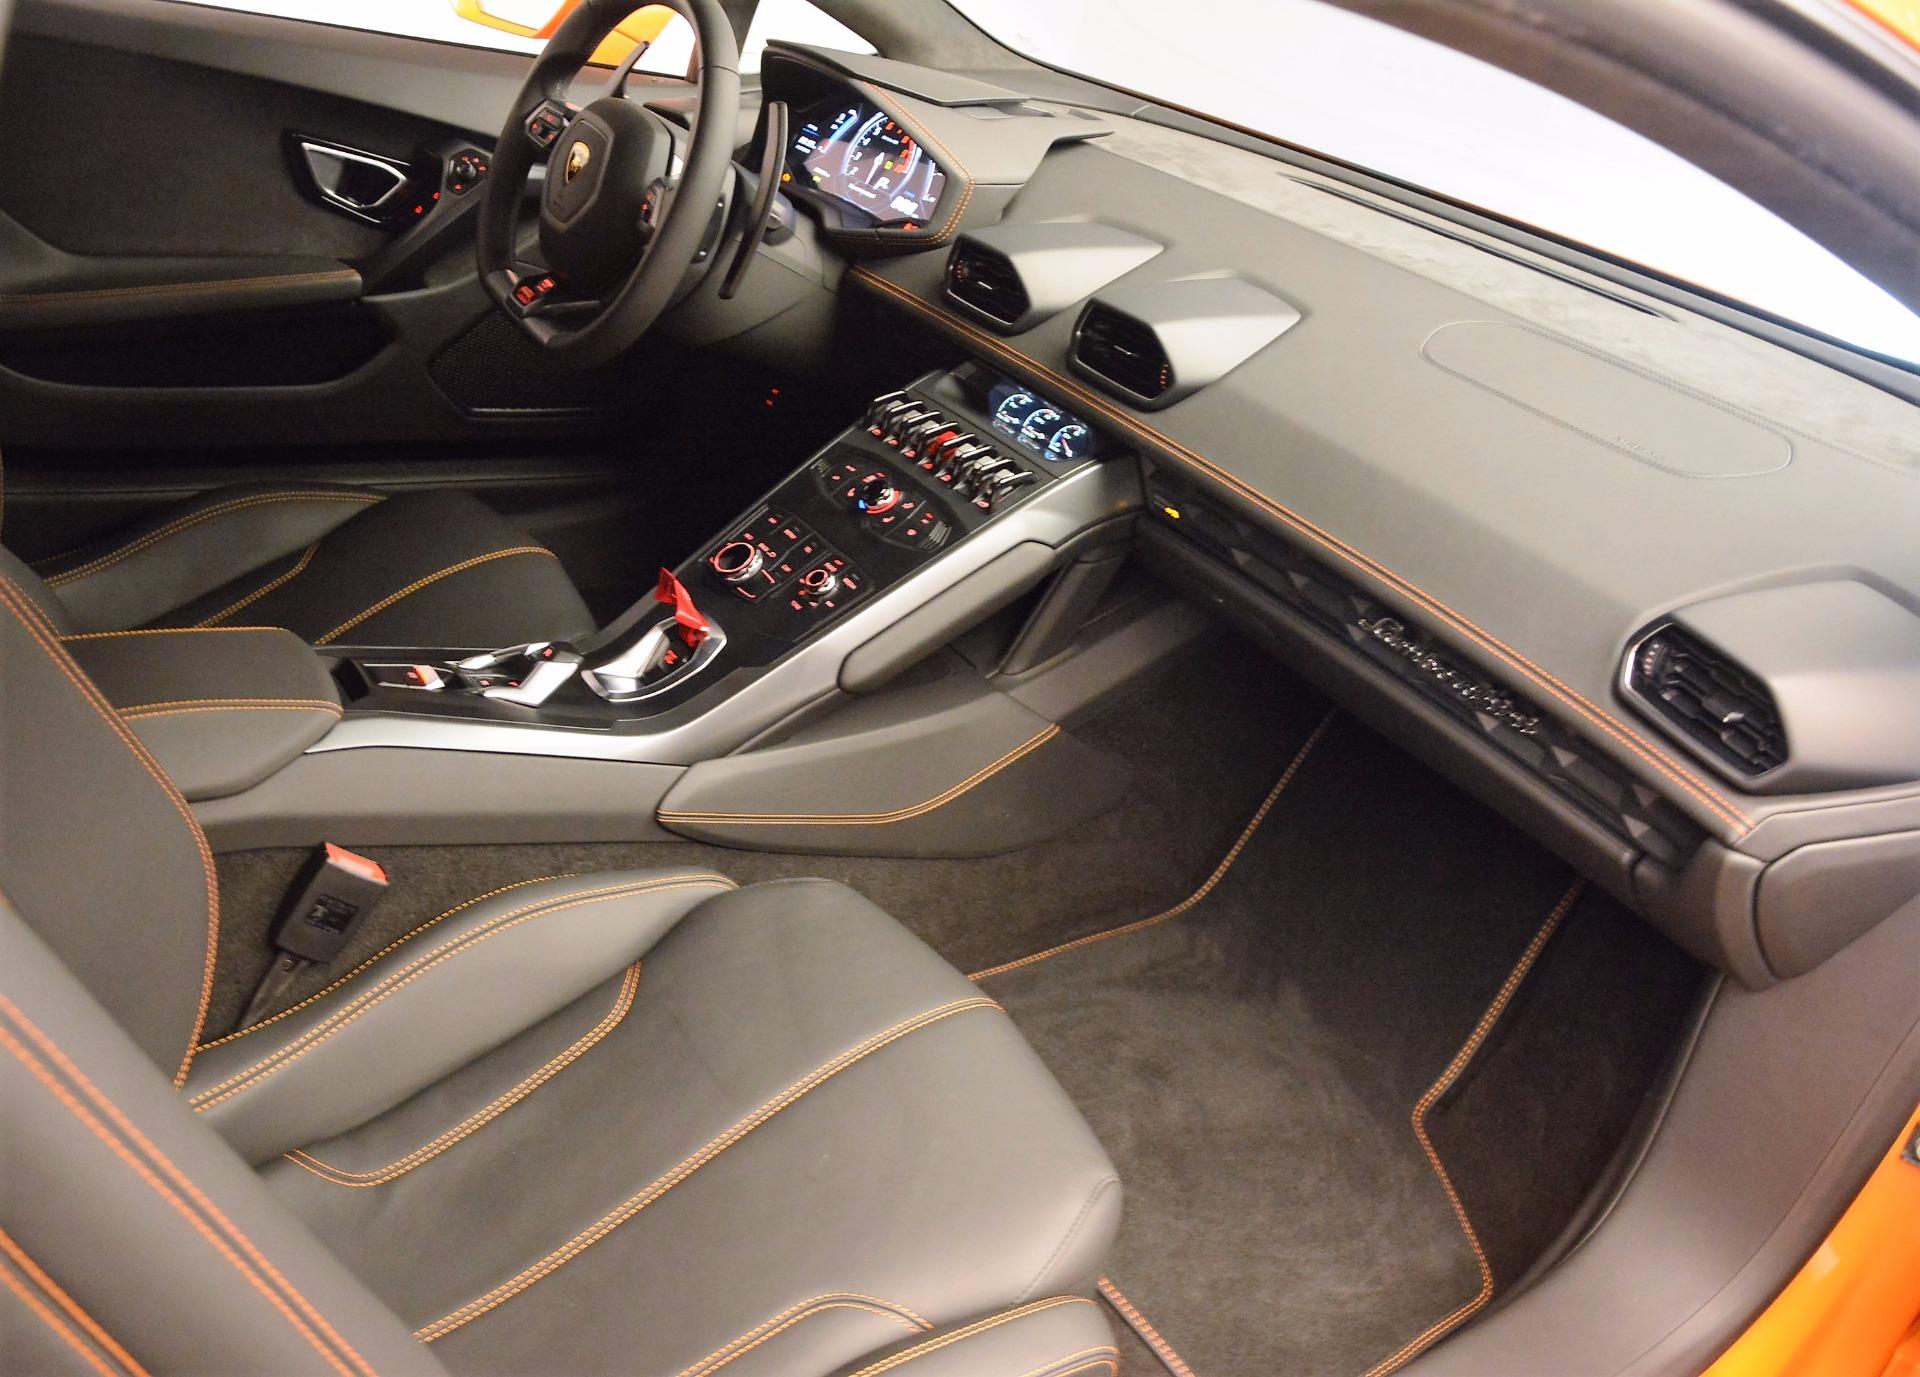 Used 2015 Lamborghini Huracan LP 610-4 For Sale In Greenwich, CT 621_p17